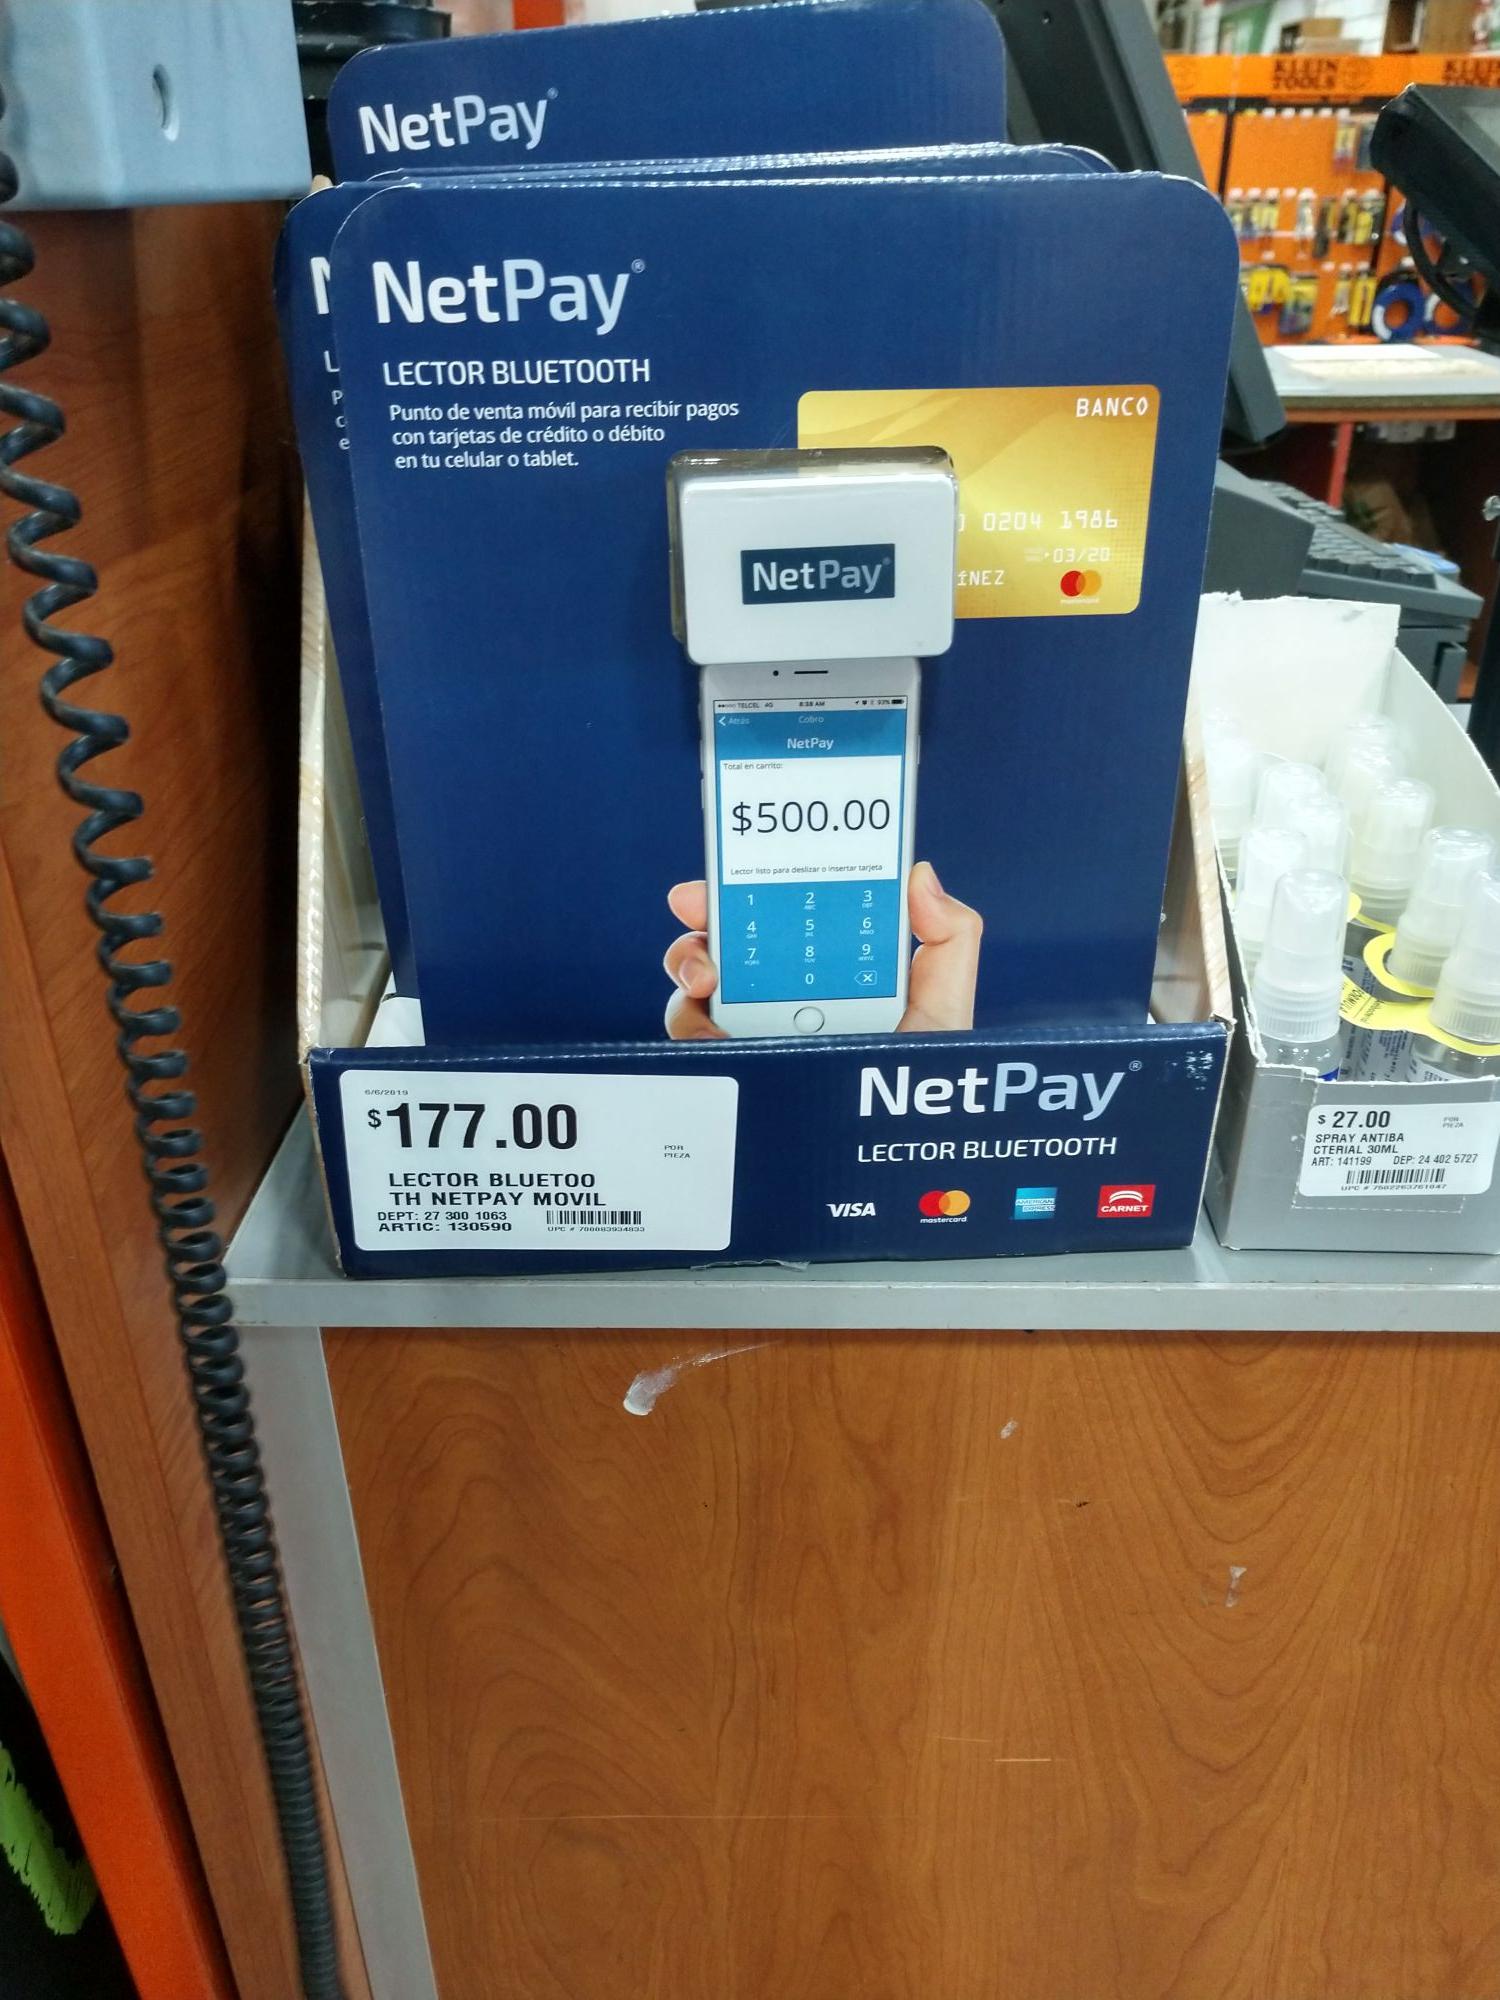 Home Depot Cumbres: NetPay punto de venta bluetooth